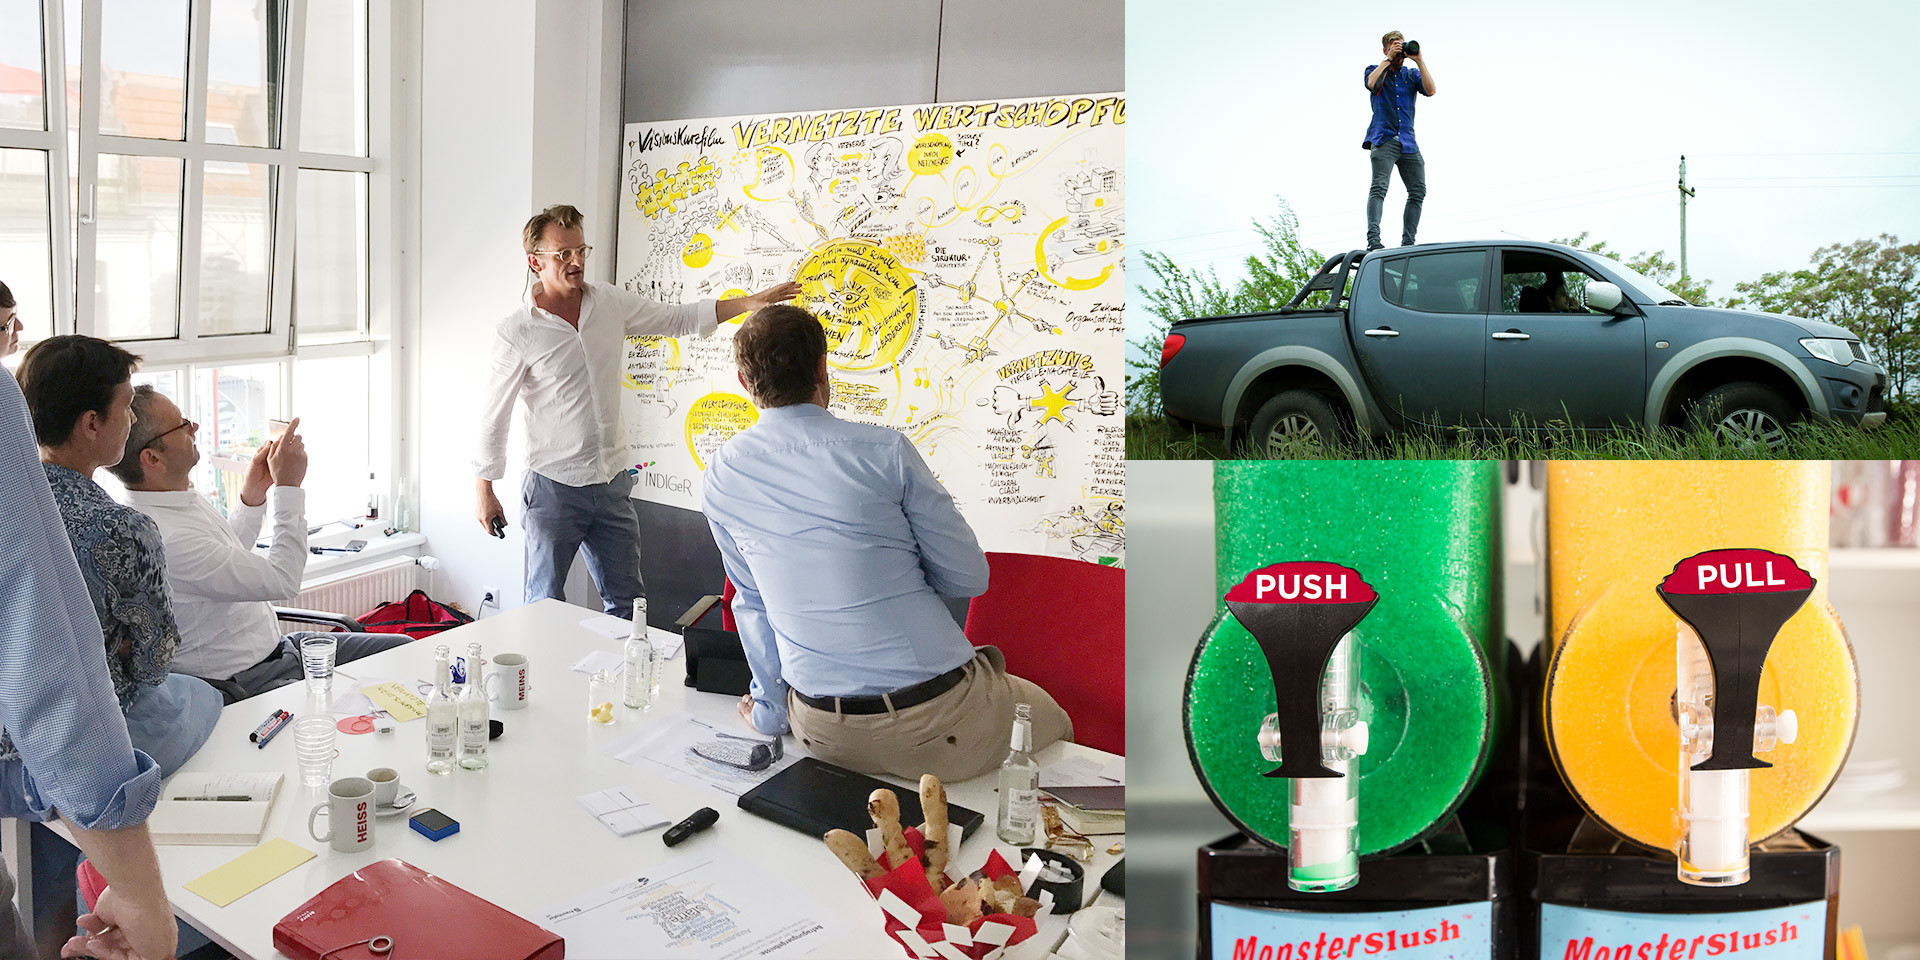 Consulting, Marketing & Communication Strategy, Brand Development & Management, Workshops